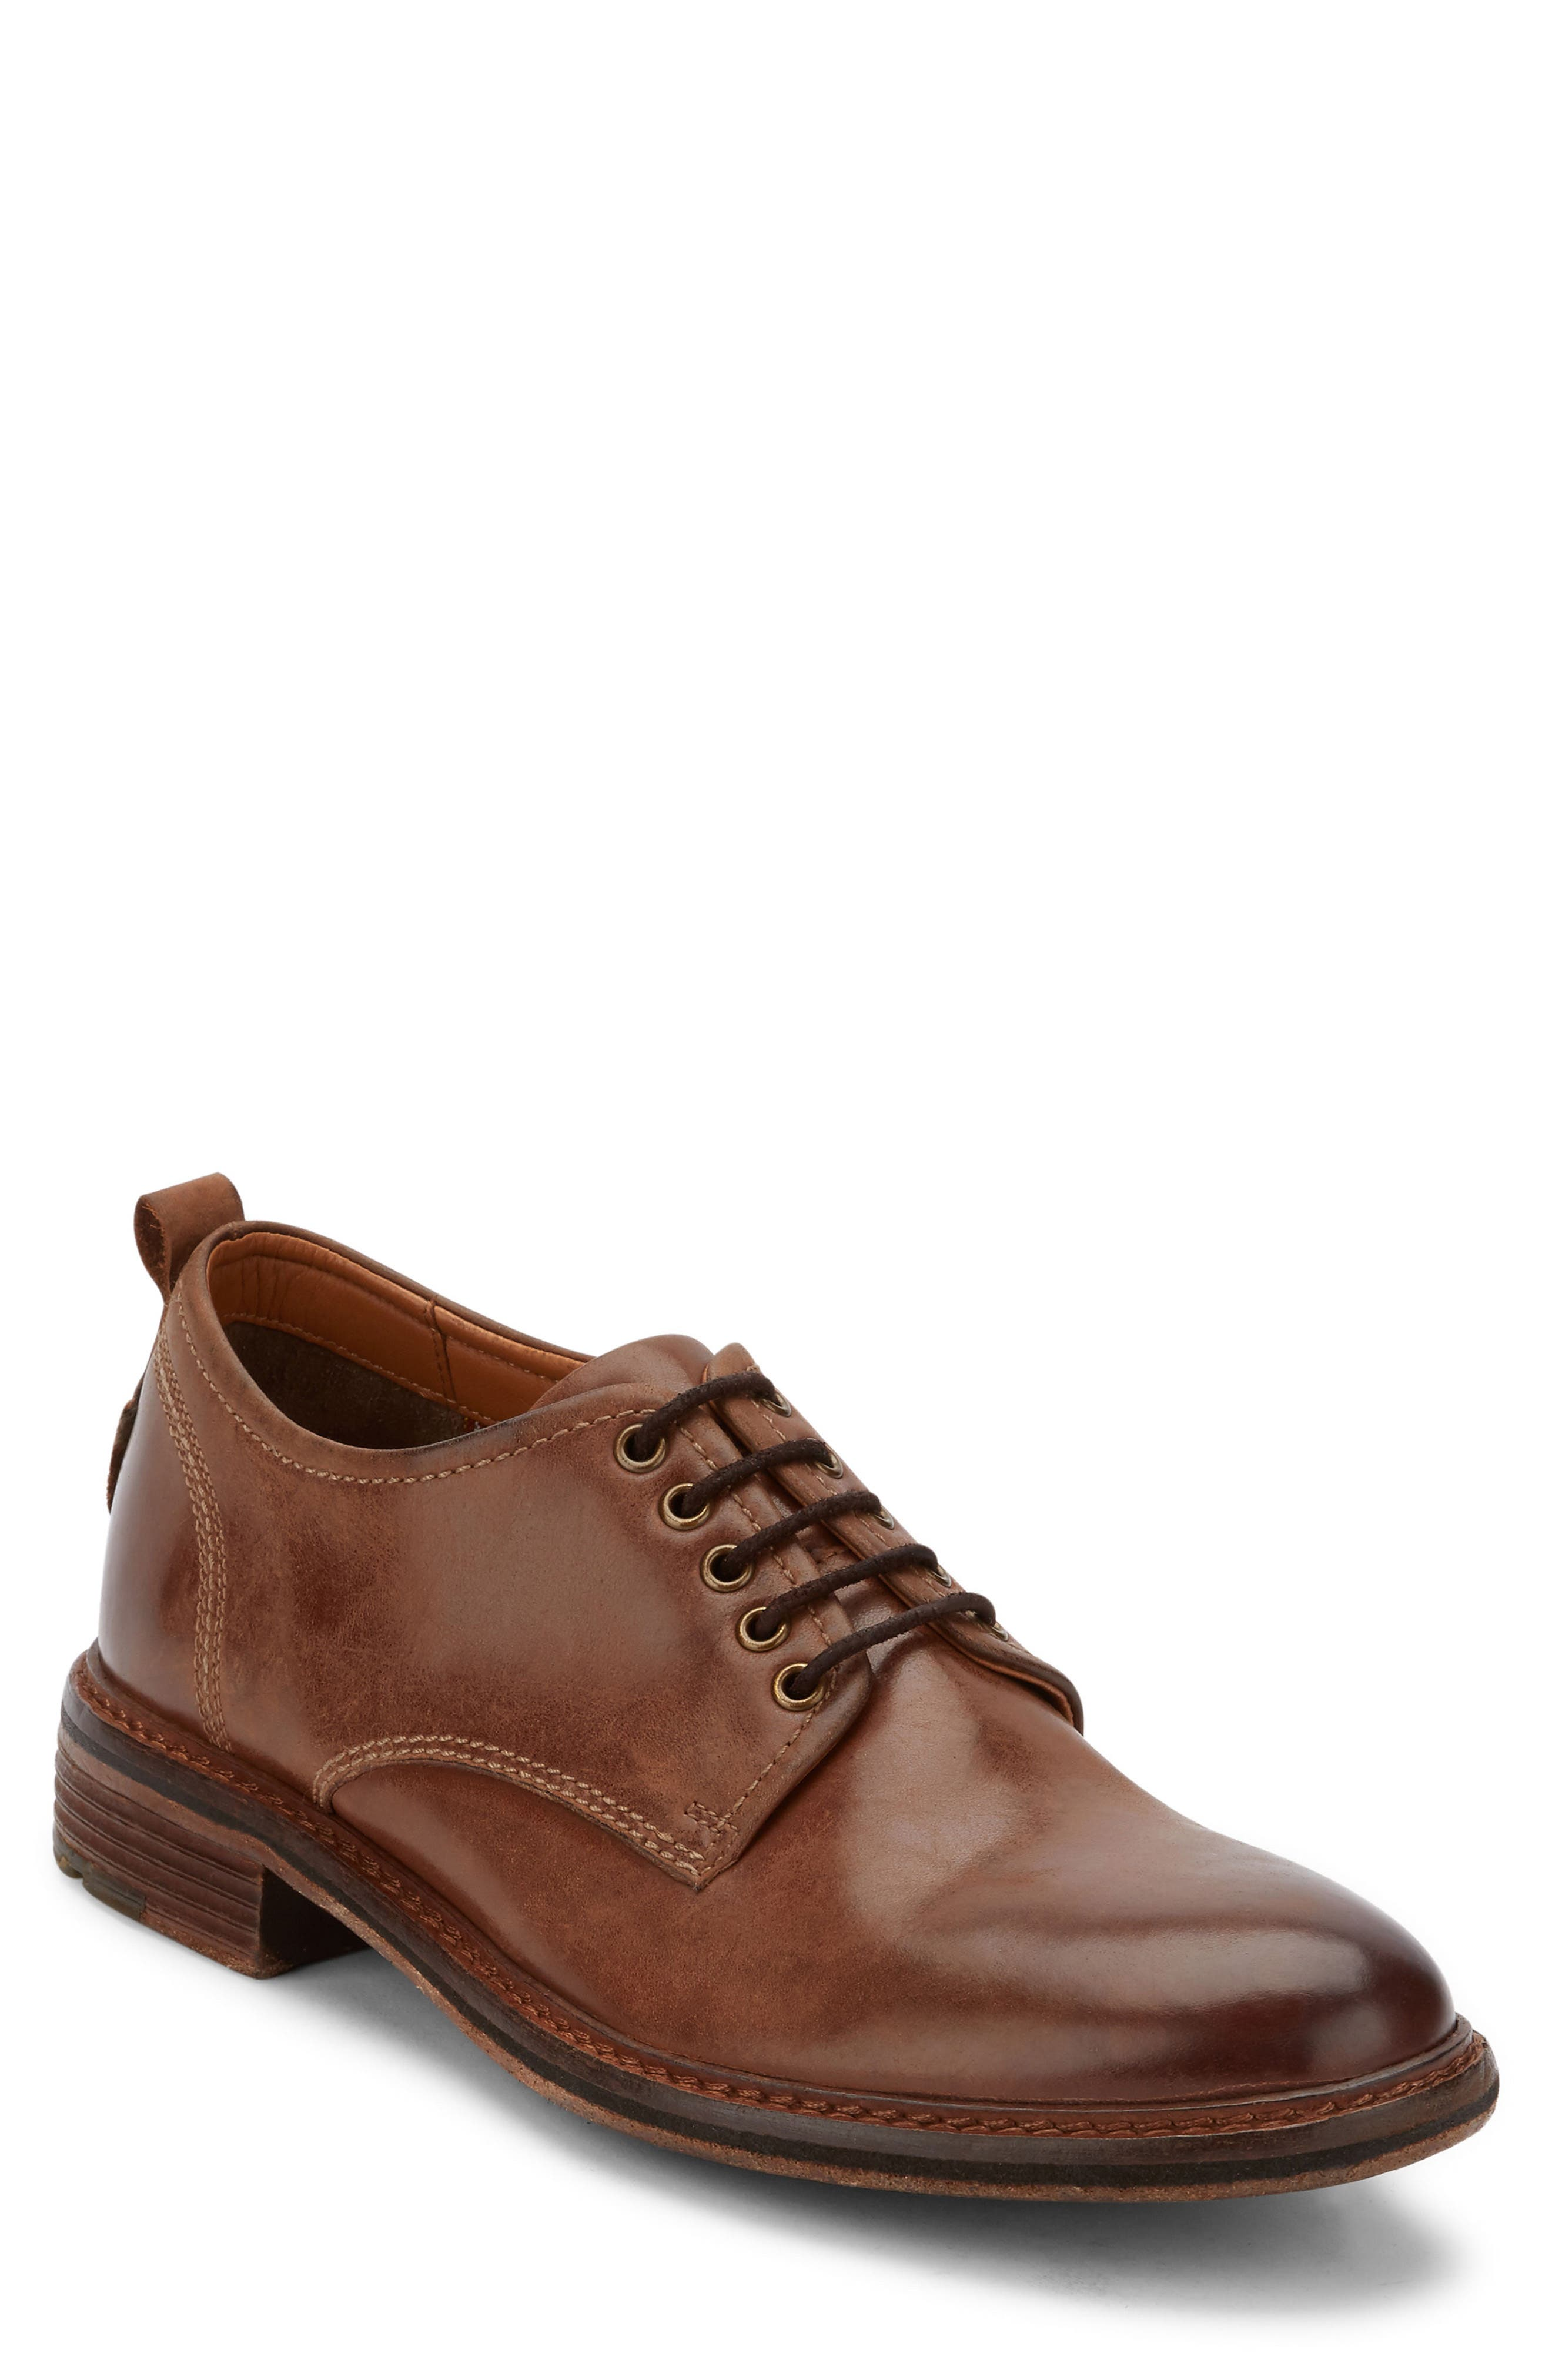 Alternate Image 1 Selected - G.H. Bass Hanson Plain Toe Derby (Men)